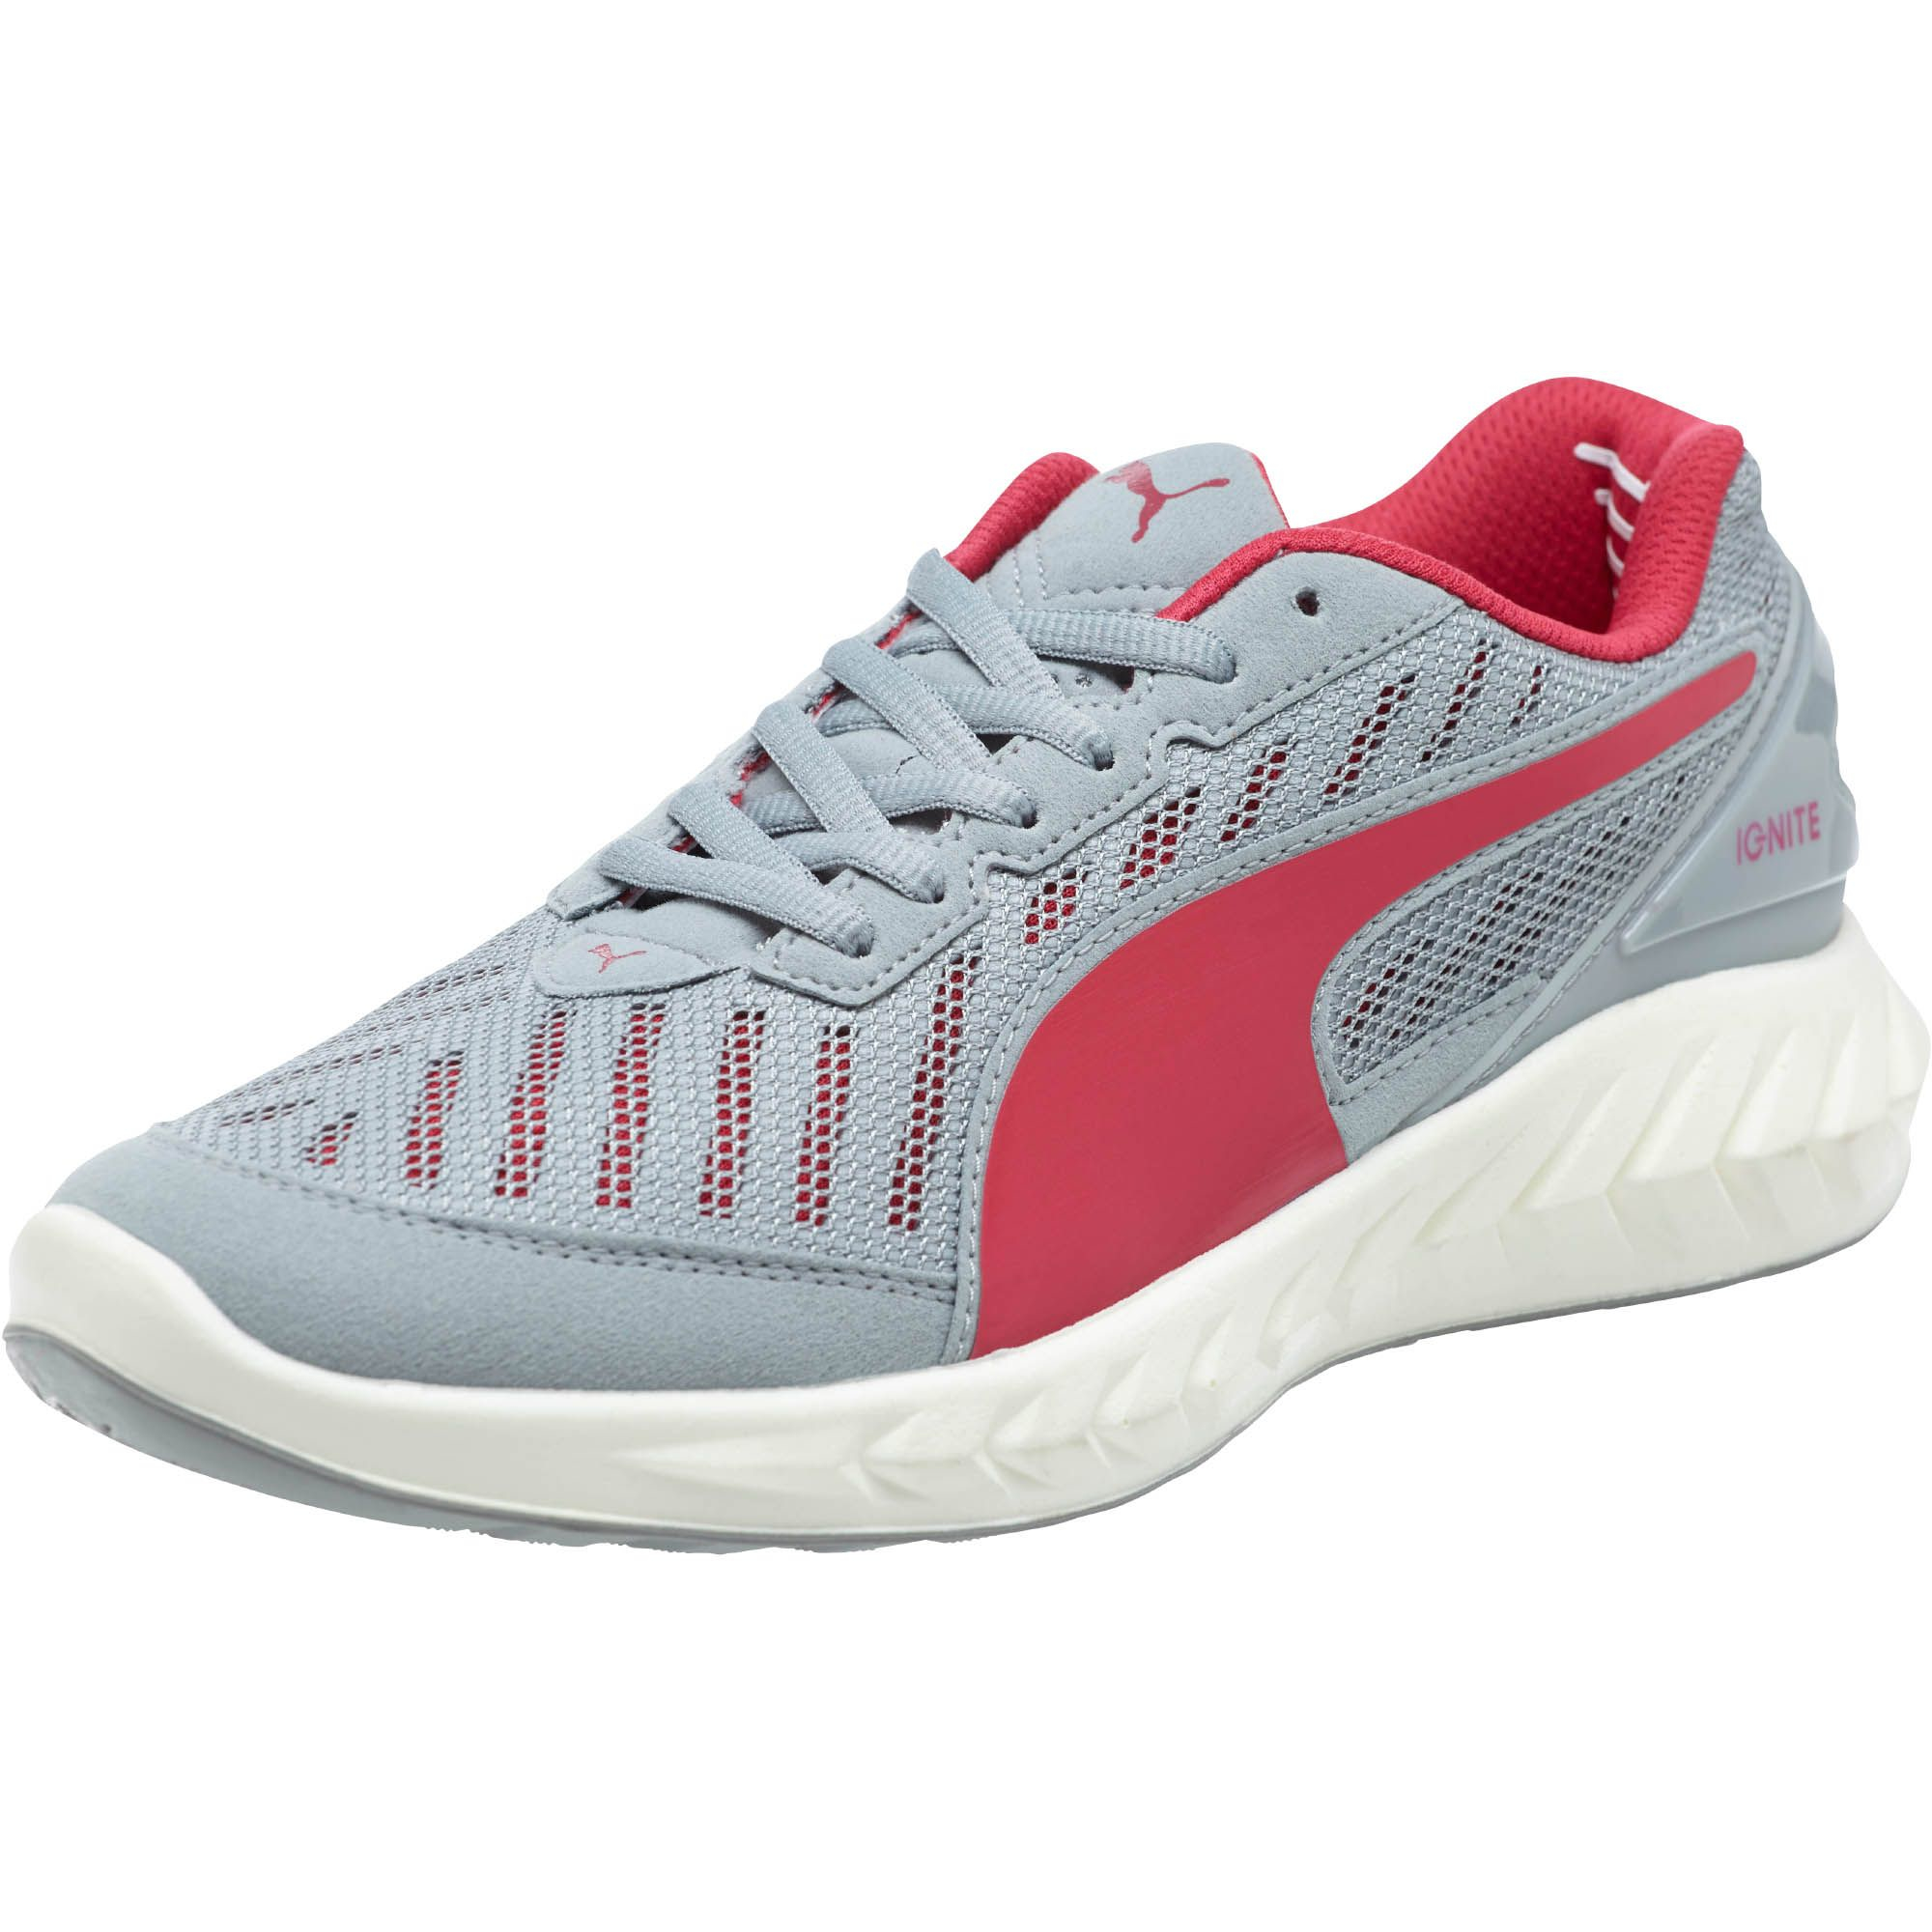 15b151b957b2f2 Lyst - PUMA Ignite Ultimate Je11 Women s Running Shoes in Gray